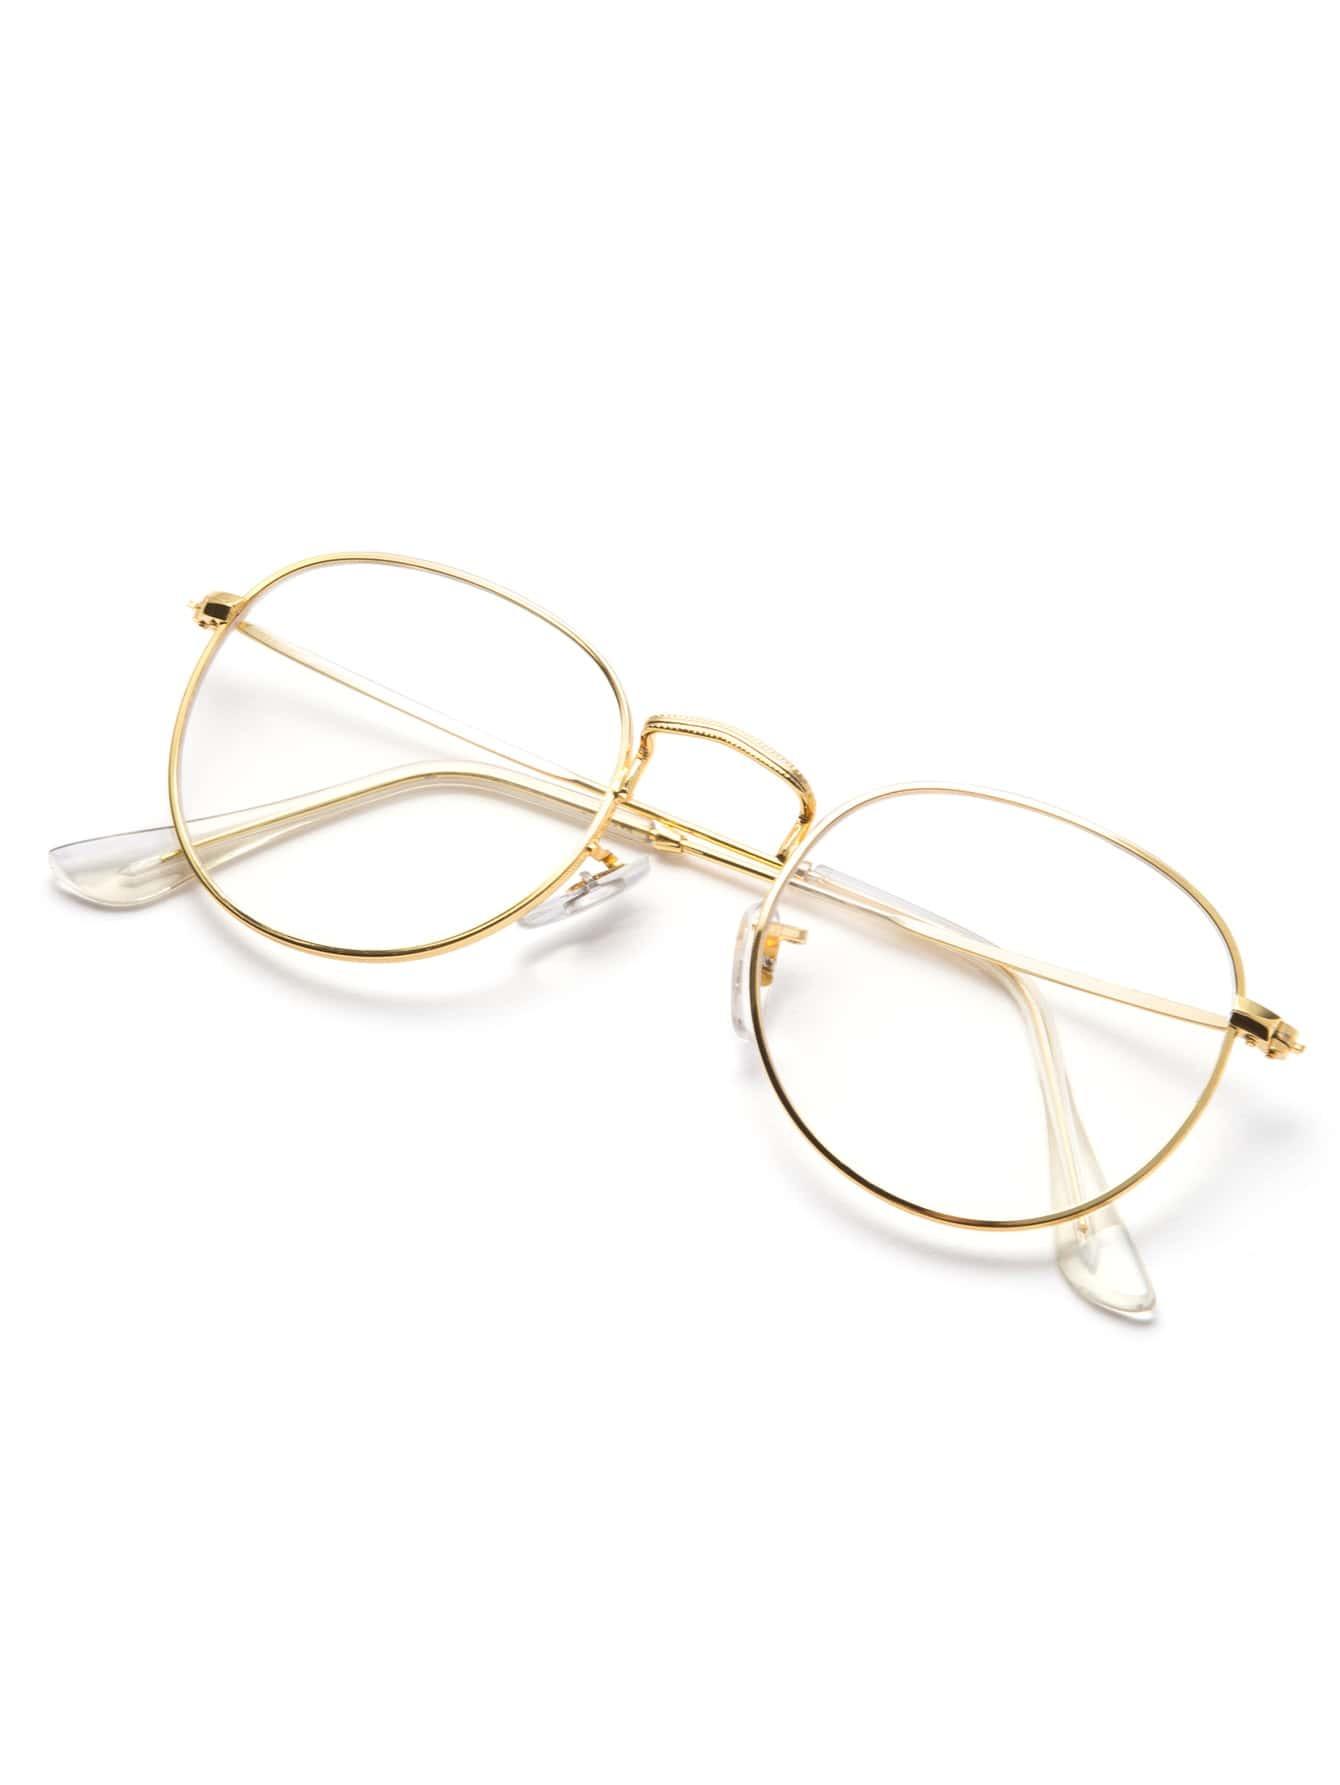 Glasses Frame Clear : Gold Frame Clear Lens Glasses -SheIn(Sheinside)